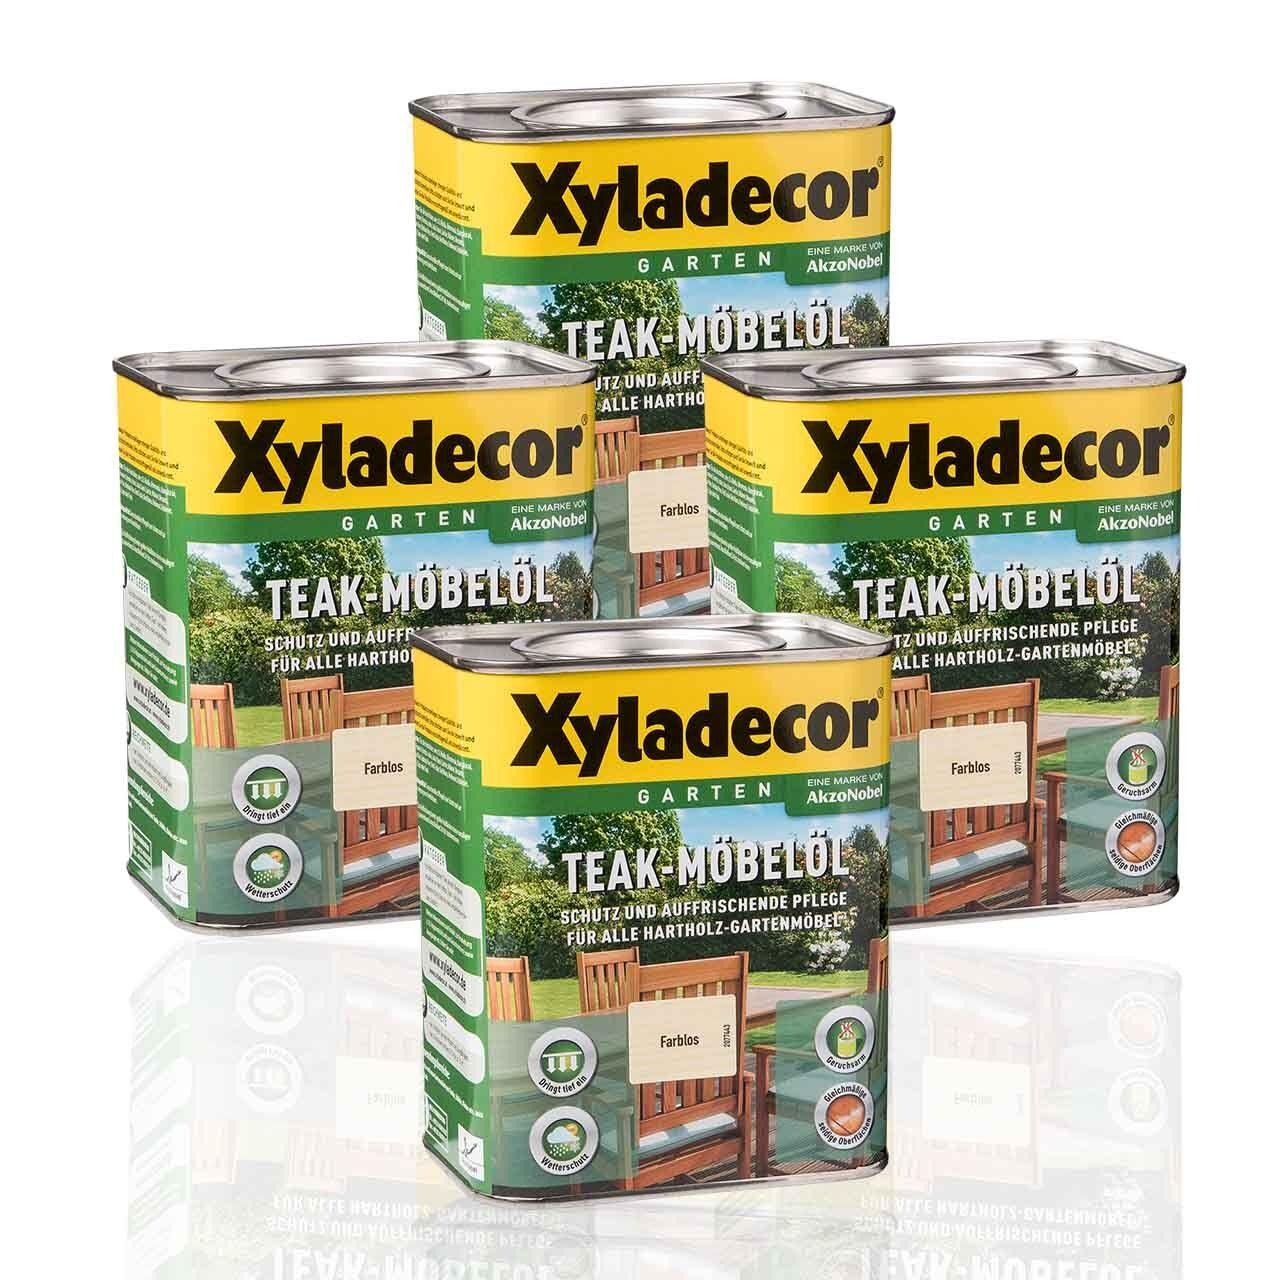 4 x Xyladecor Teak-Möbelöl farblos 0,75l - farbloses Teaköl Möbelöl Bangkiraiöl